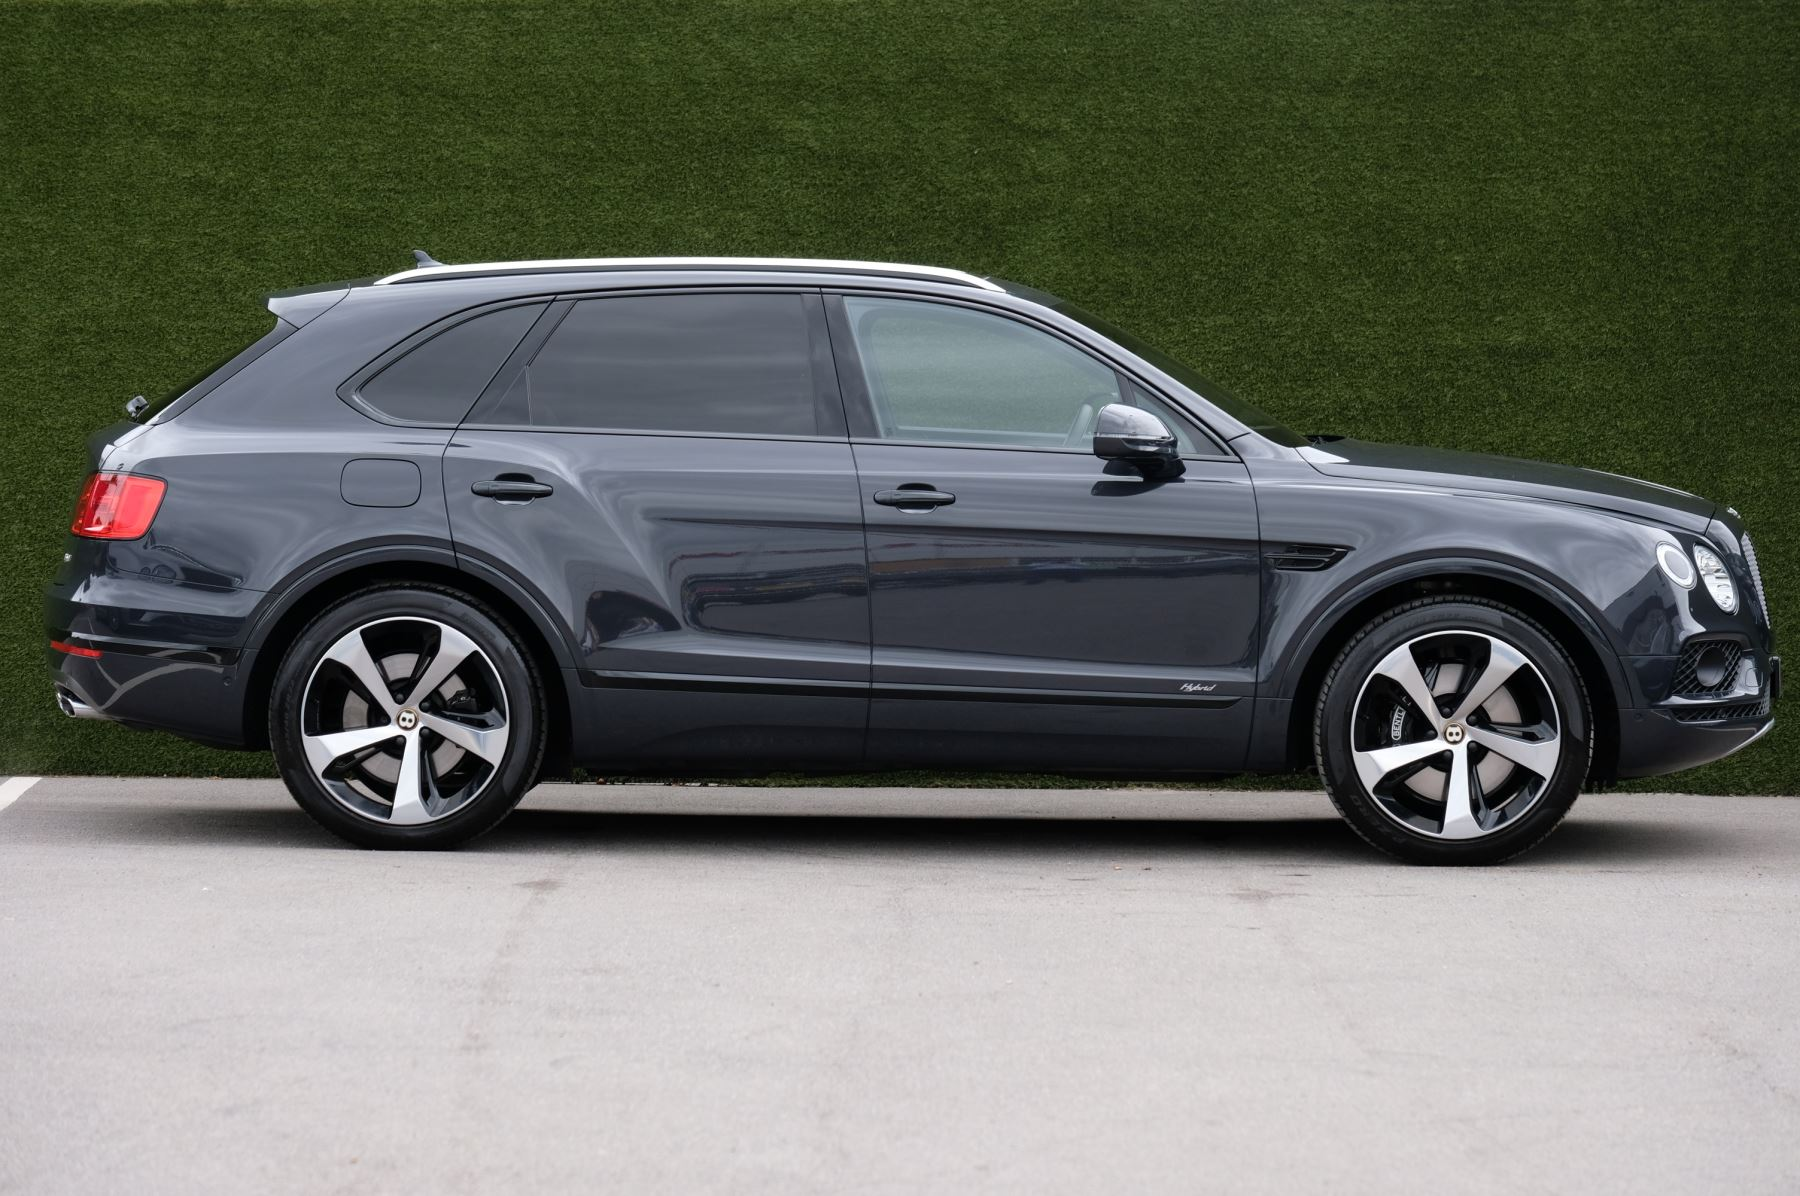 Bentley Bentayga Hybrid 3.0 V6 5dr image 3